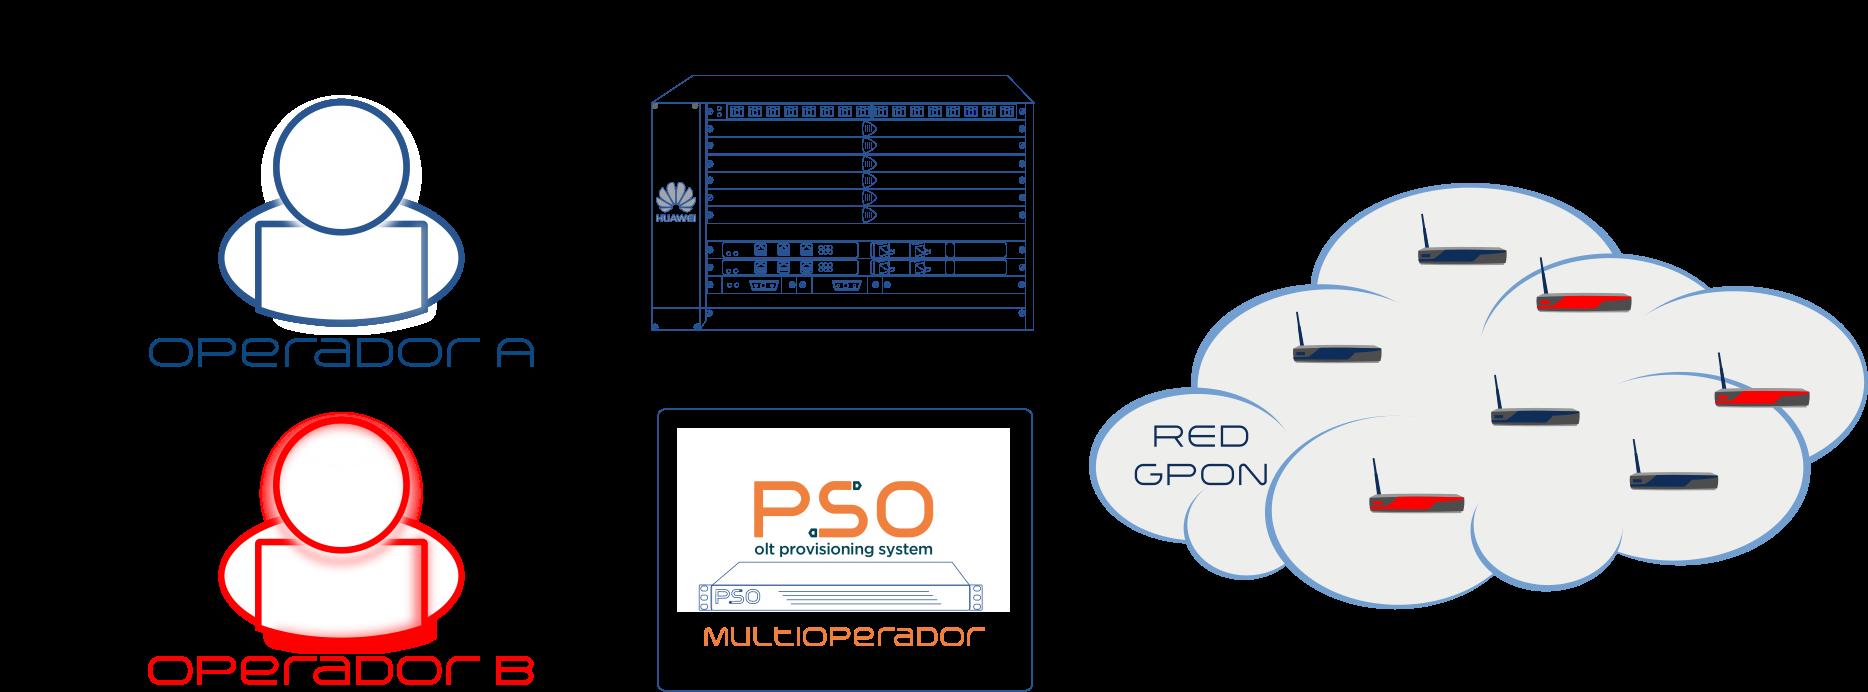 PSO System Multioperador